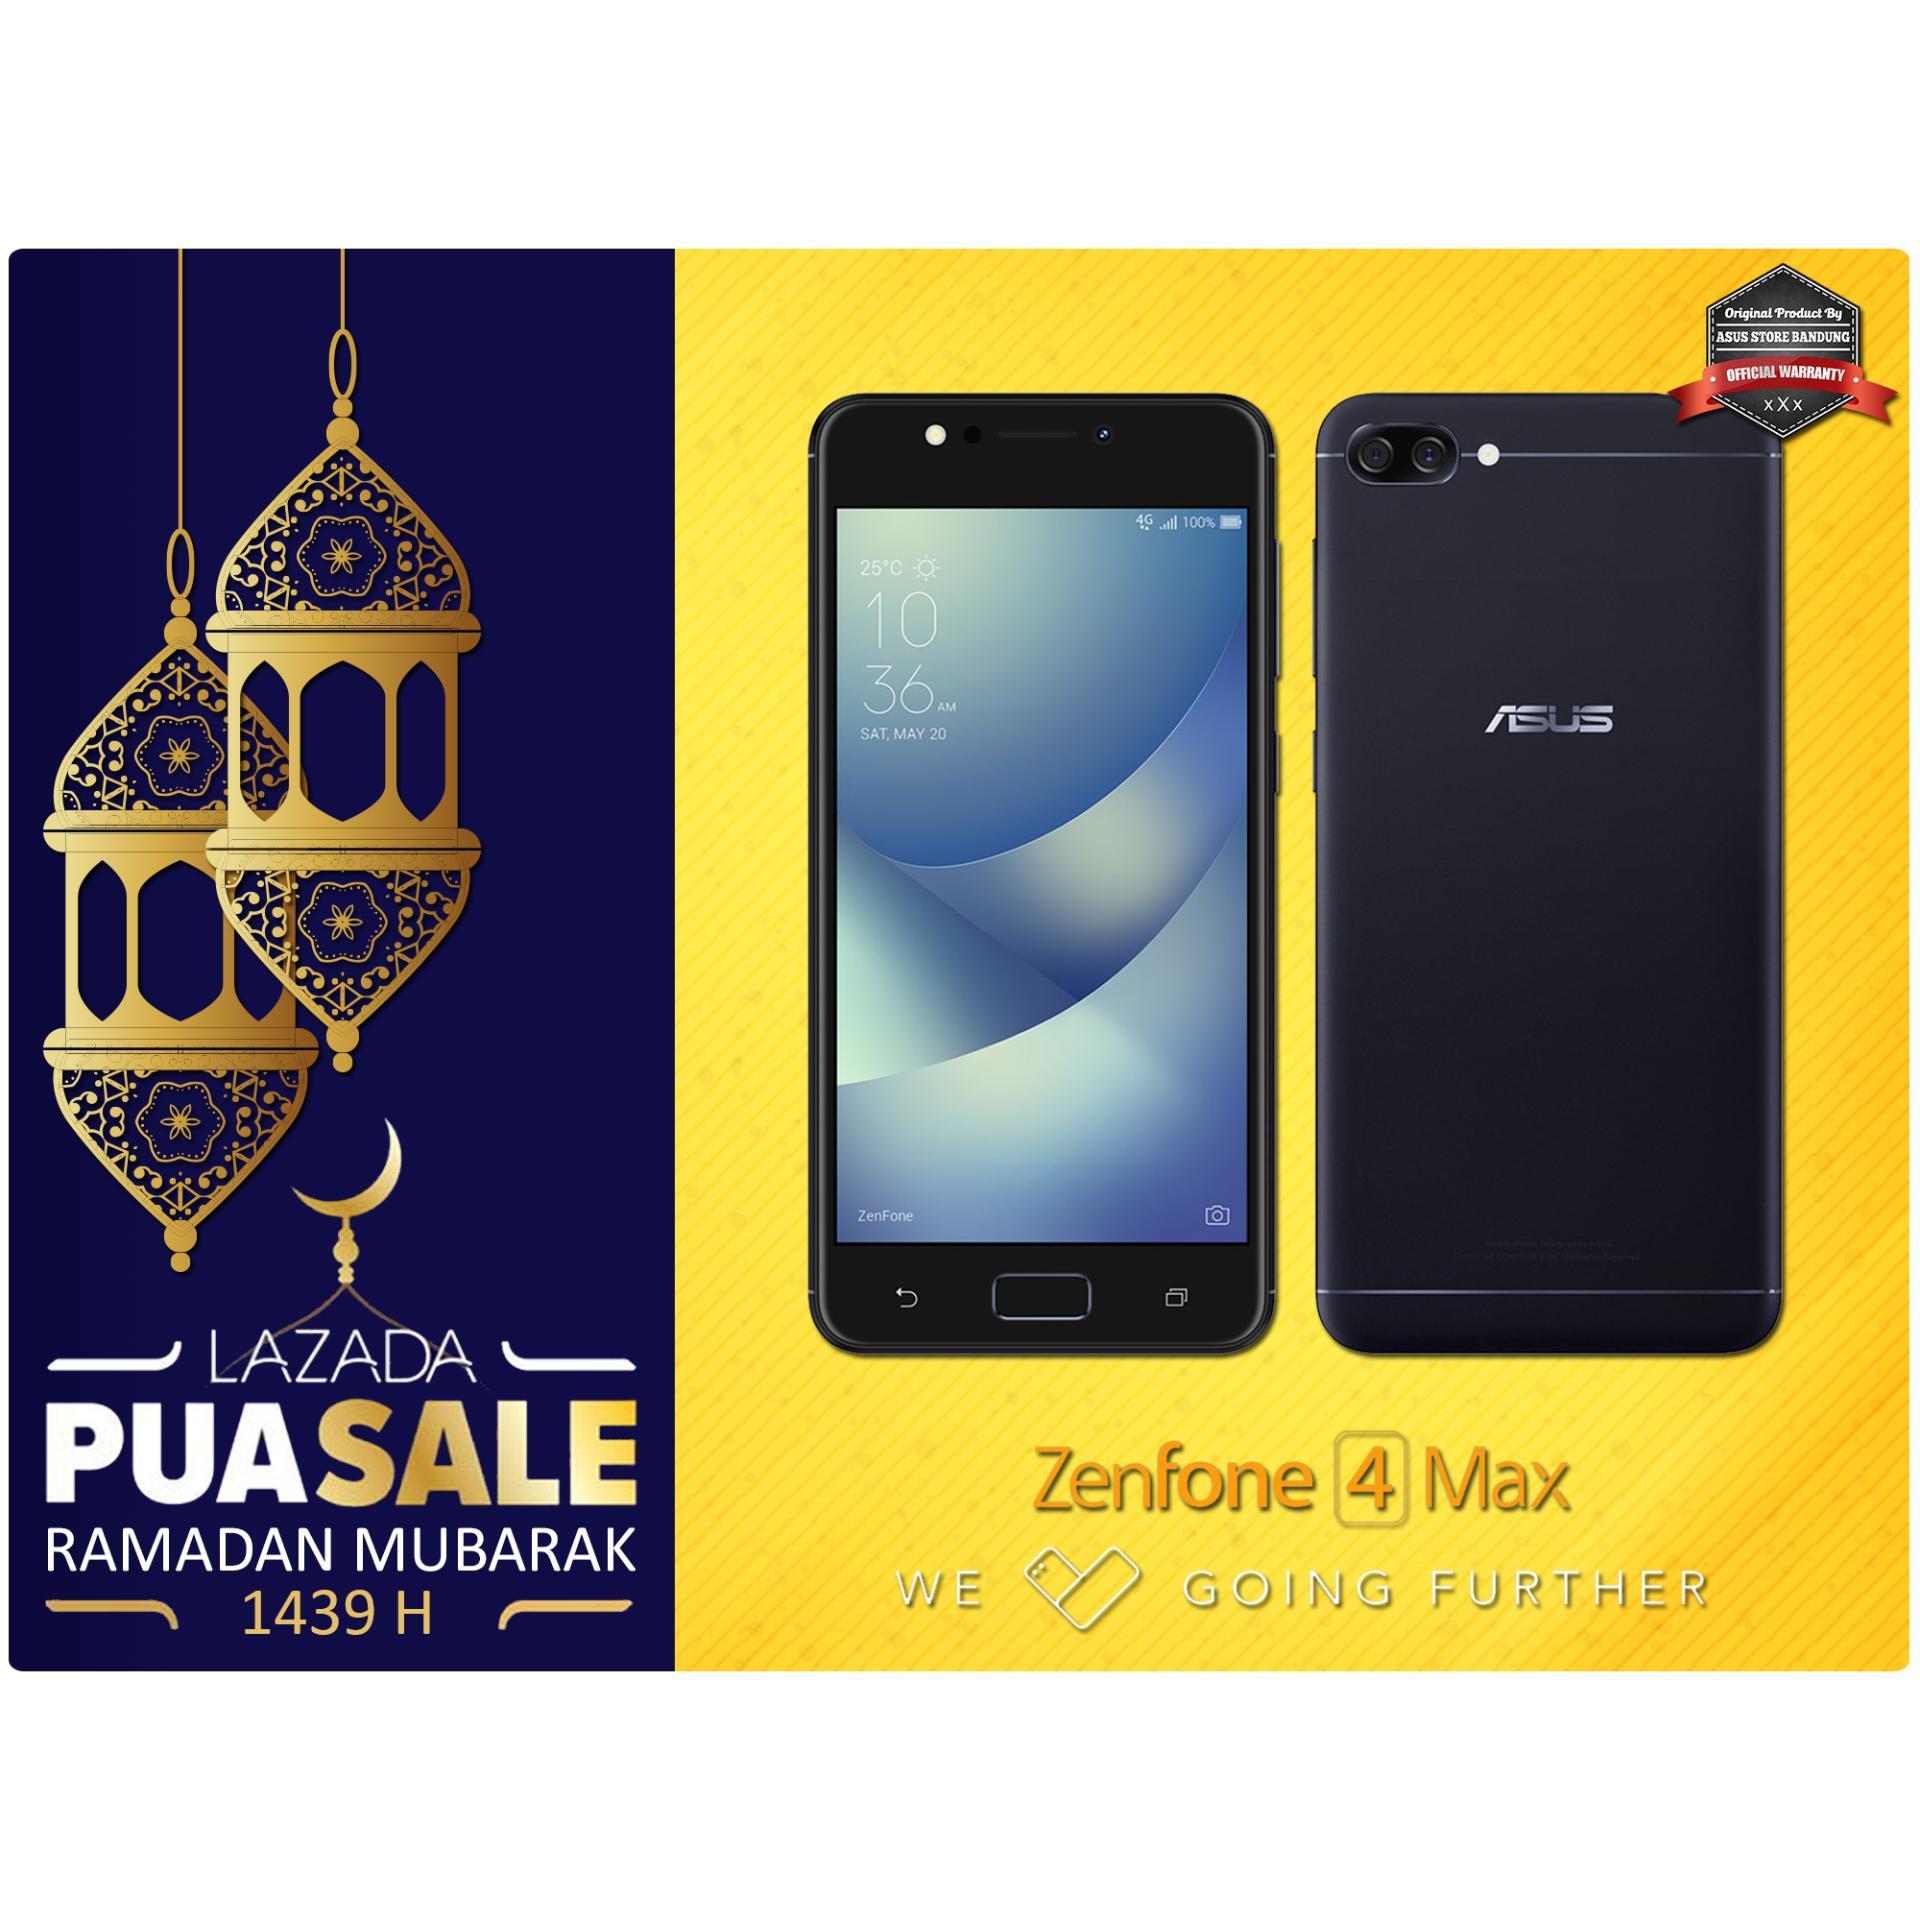 Asus Zenfone 4 Max ZC520KL 4G 3/32 13MP + 5MP + 8MP Android N + Free Snack Spesial Ramadan Garansi Resmi